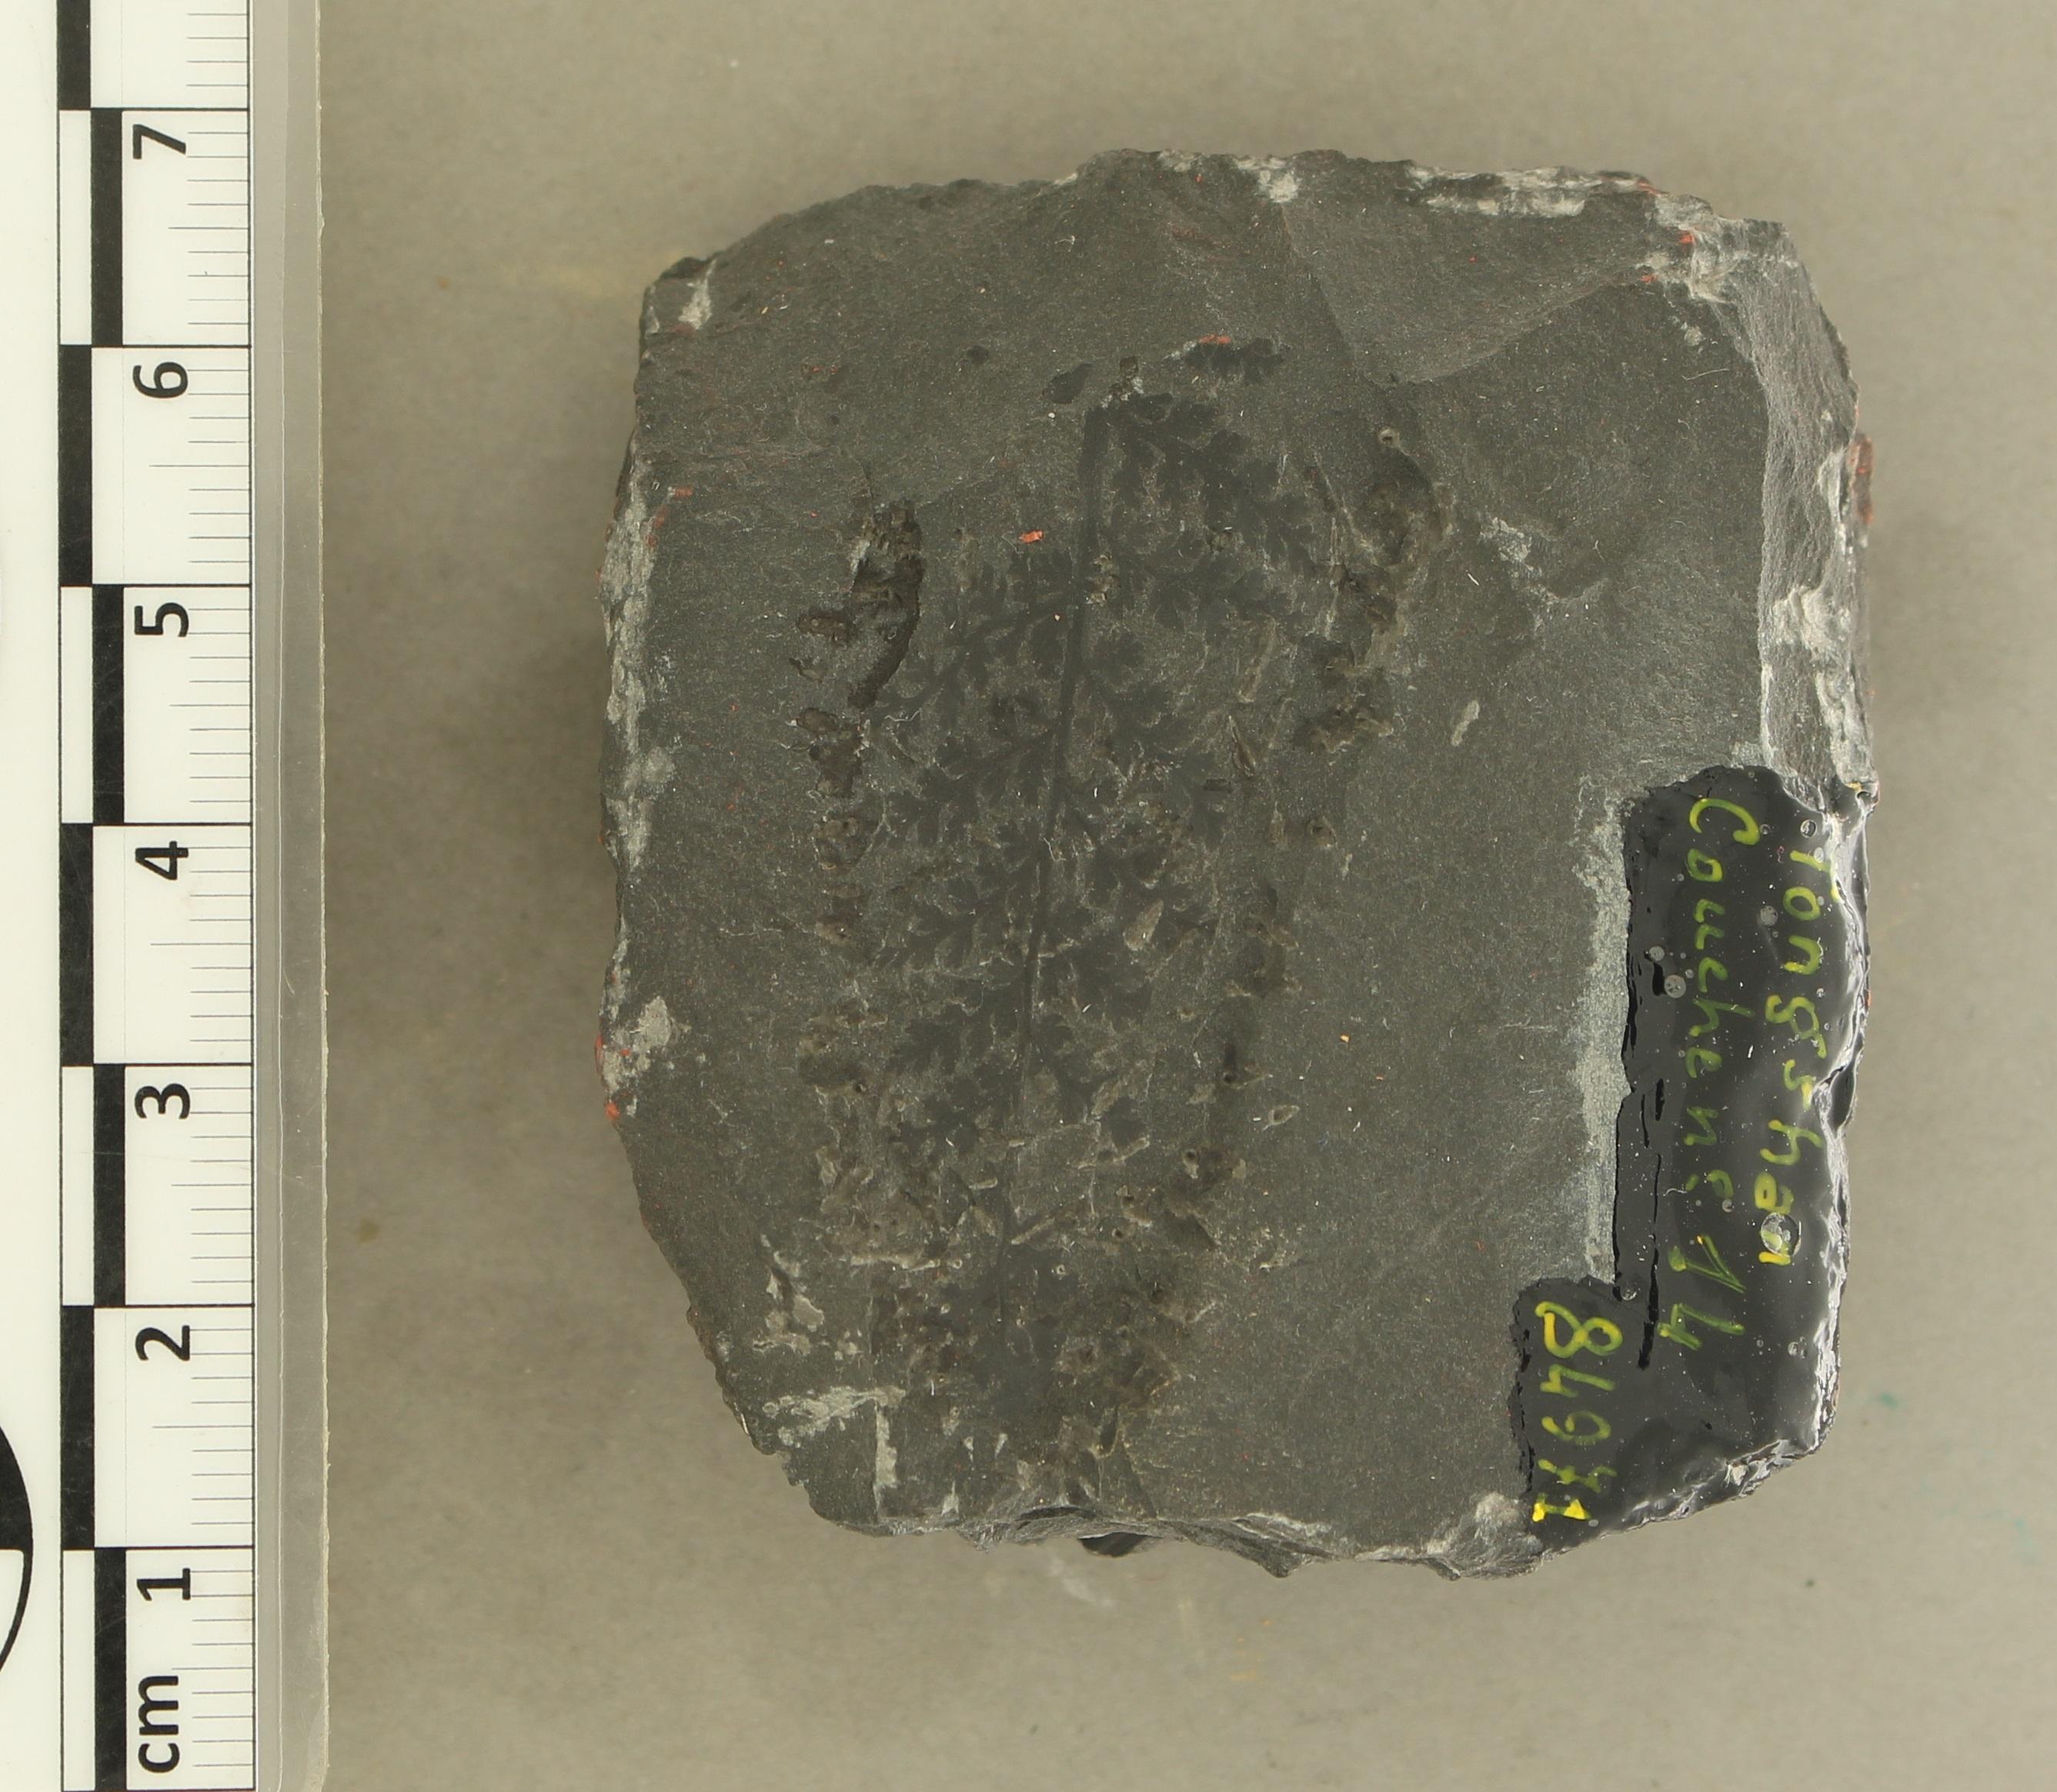 IRSNB b 8586 - Detail